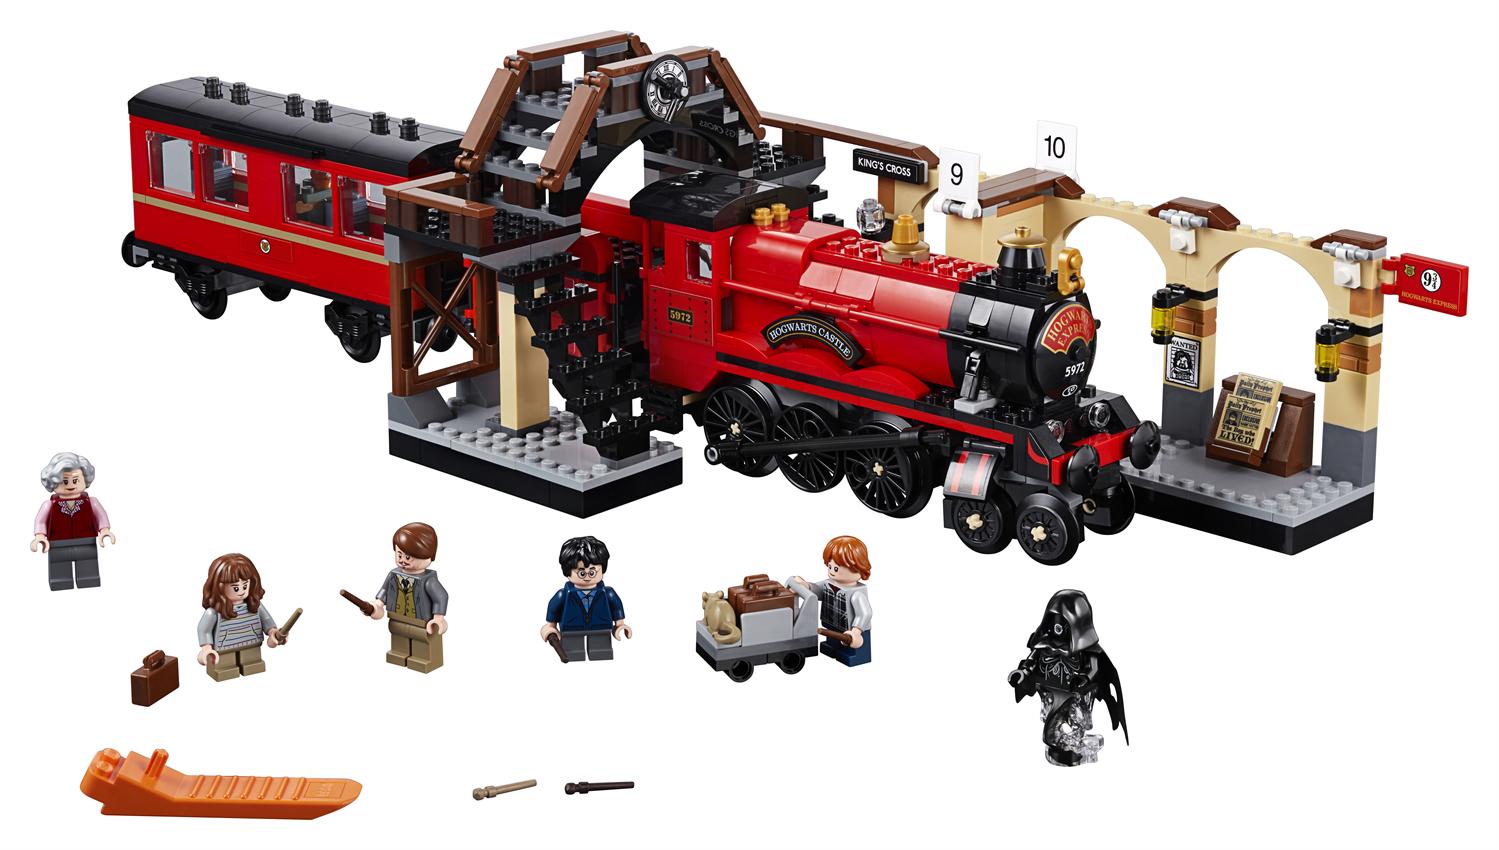 Lego Harry Potter 75955 Espresso per Hogwarts